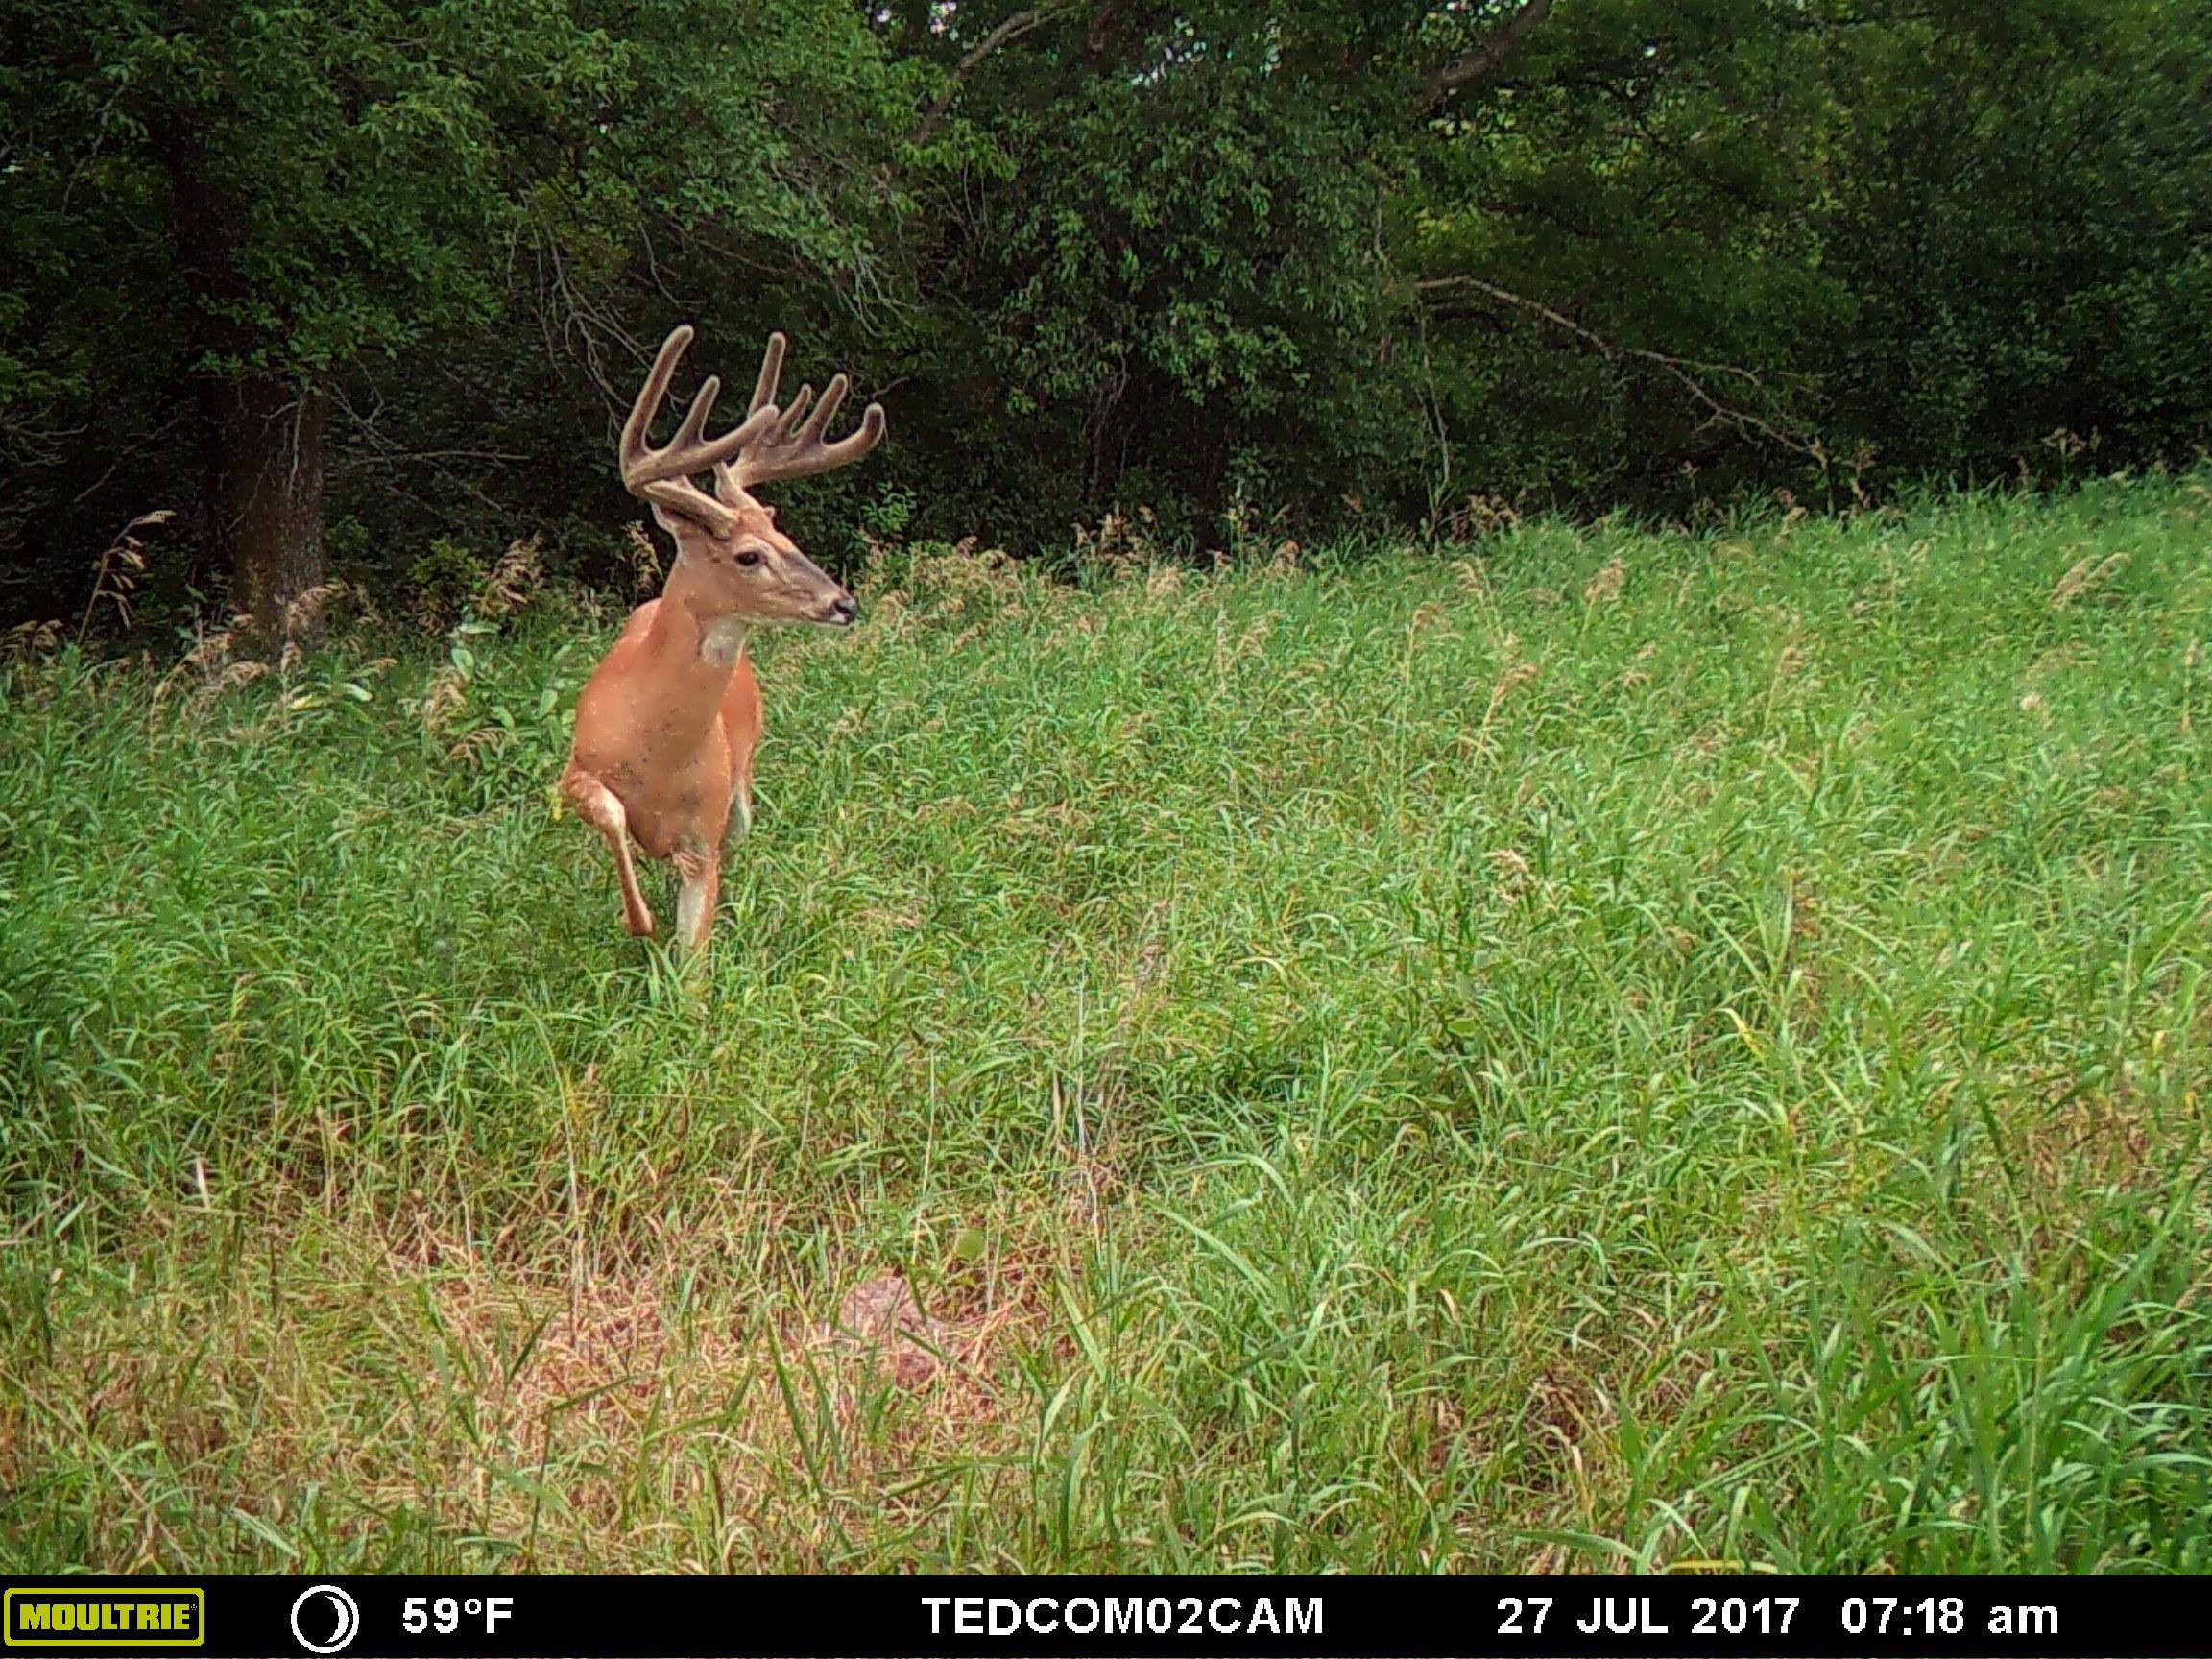 This year, I think I have a legitimate shot at killing this buck.